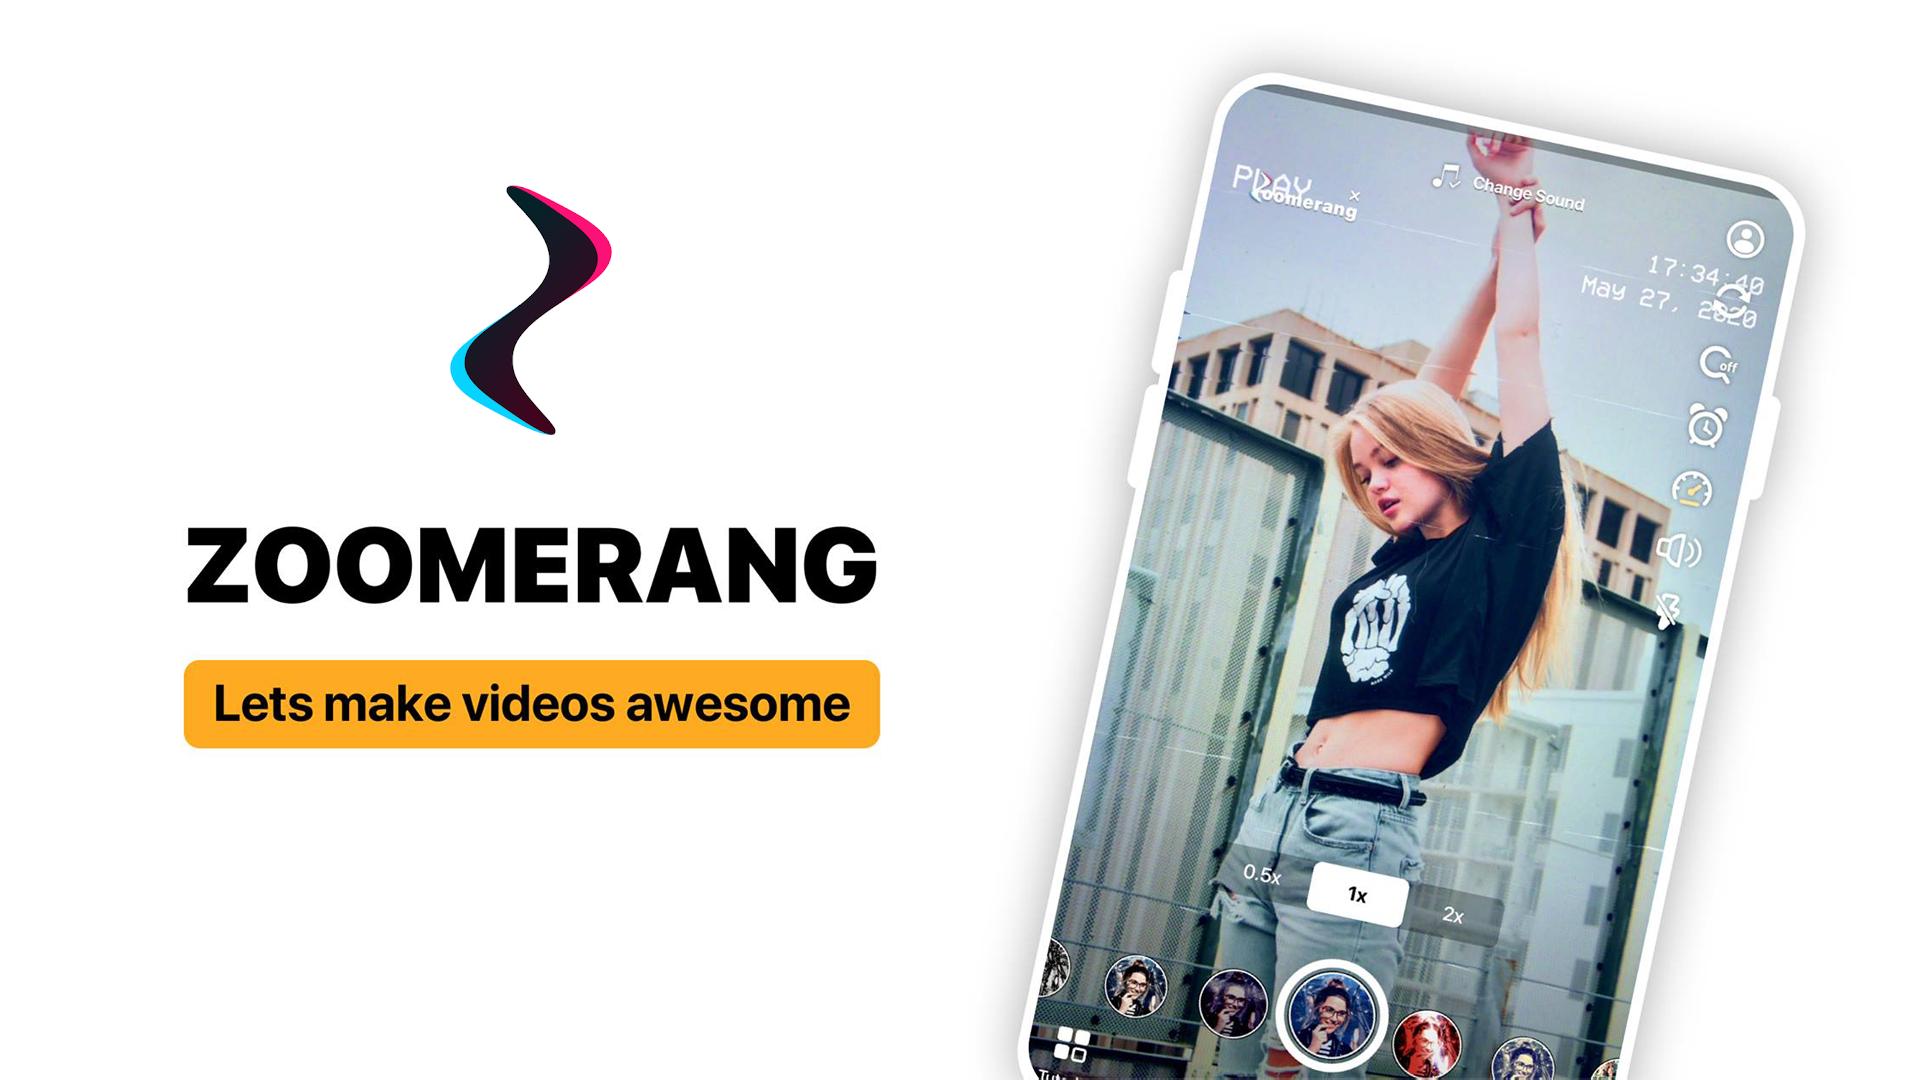 Zoomerang-banner